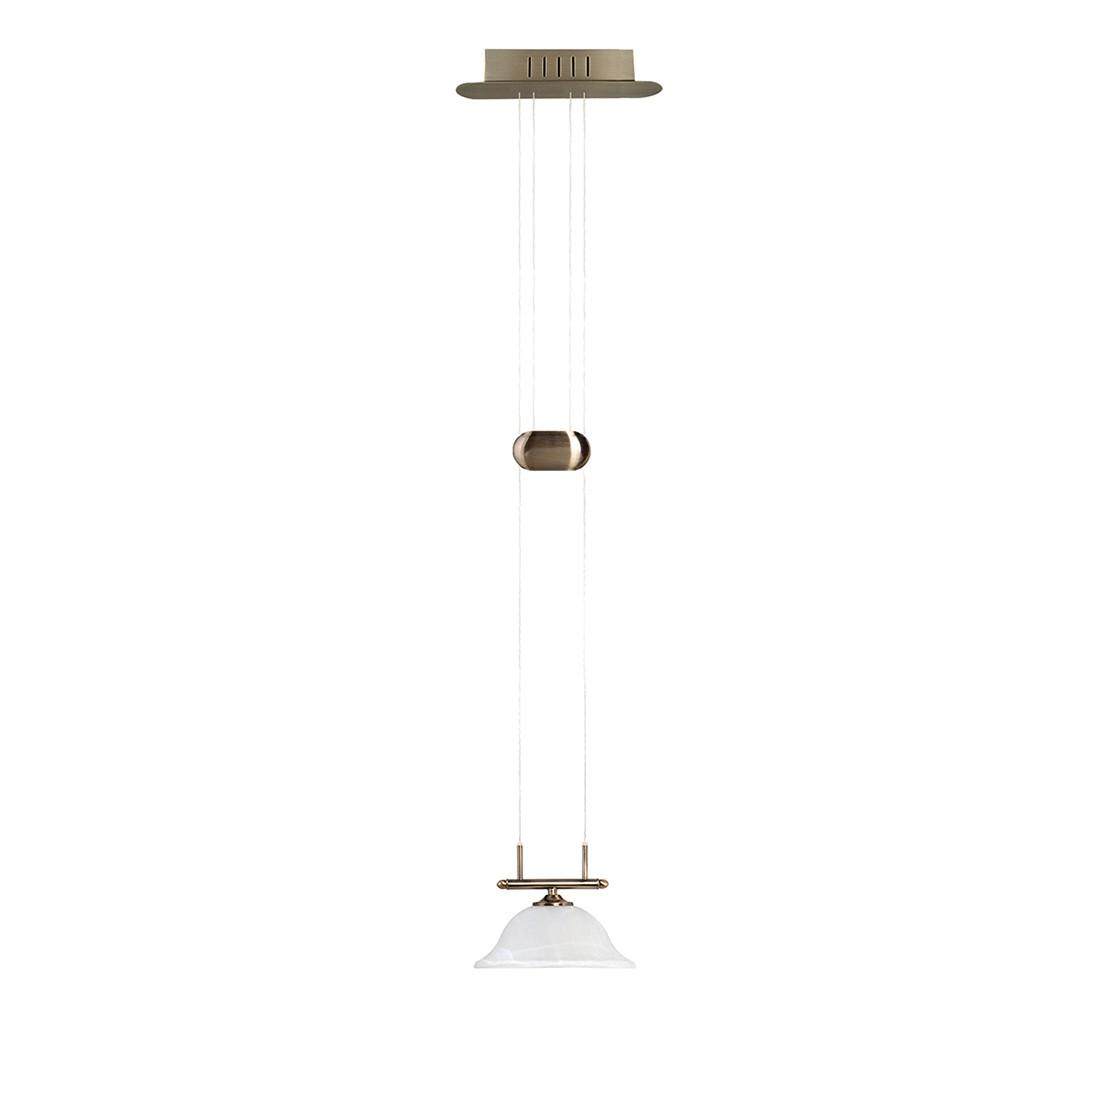 LED Pendelleuchte Alessia Altmessing ● Metall ● 1-flammig- Sorpetaler A+